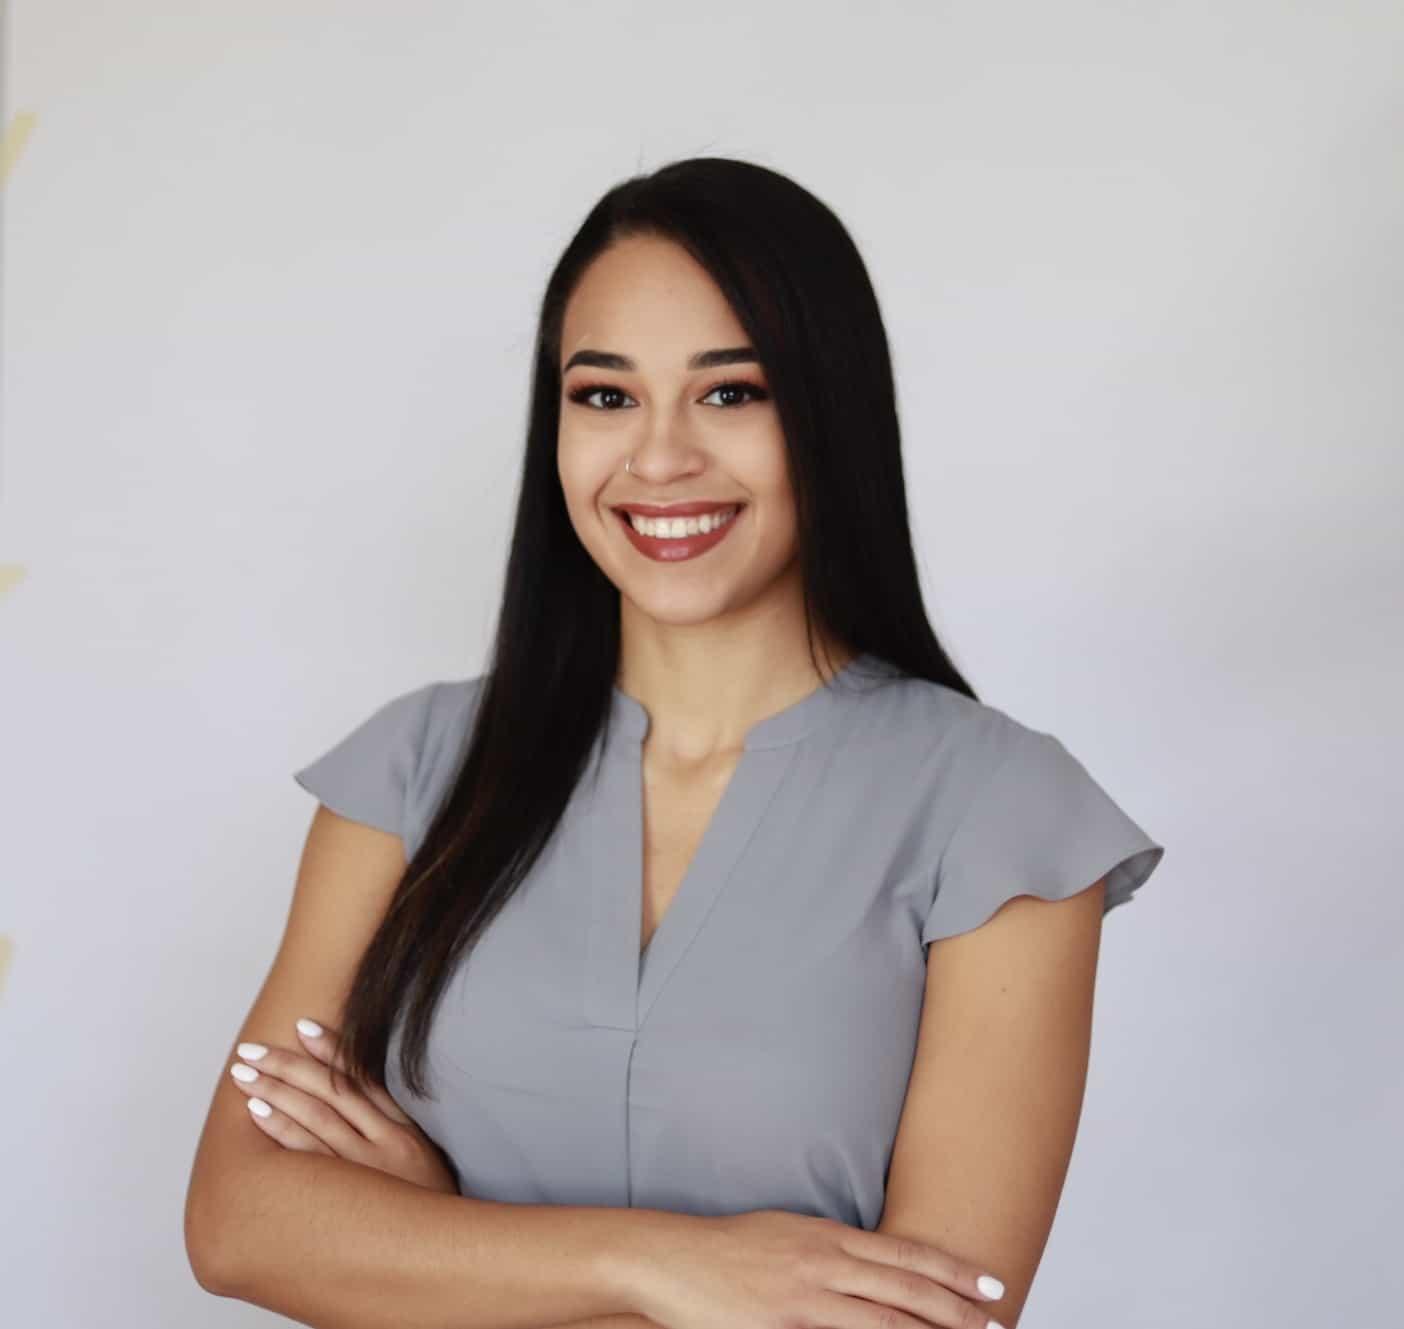 Kayla Mendoza